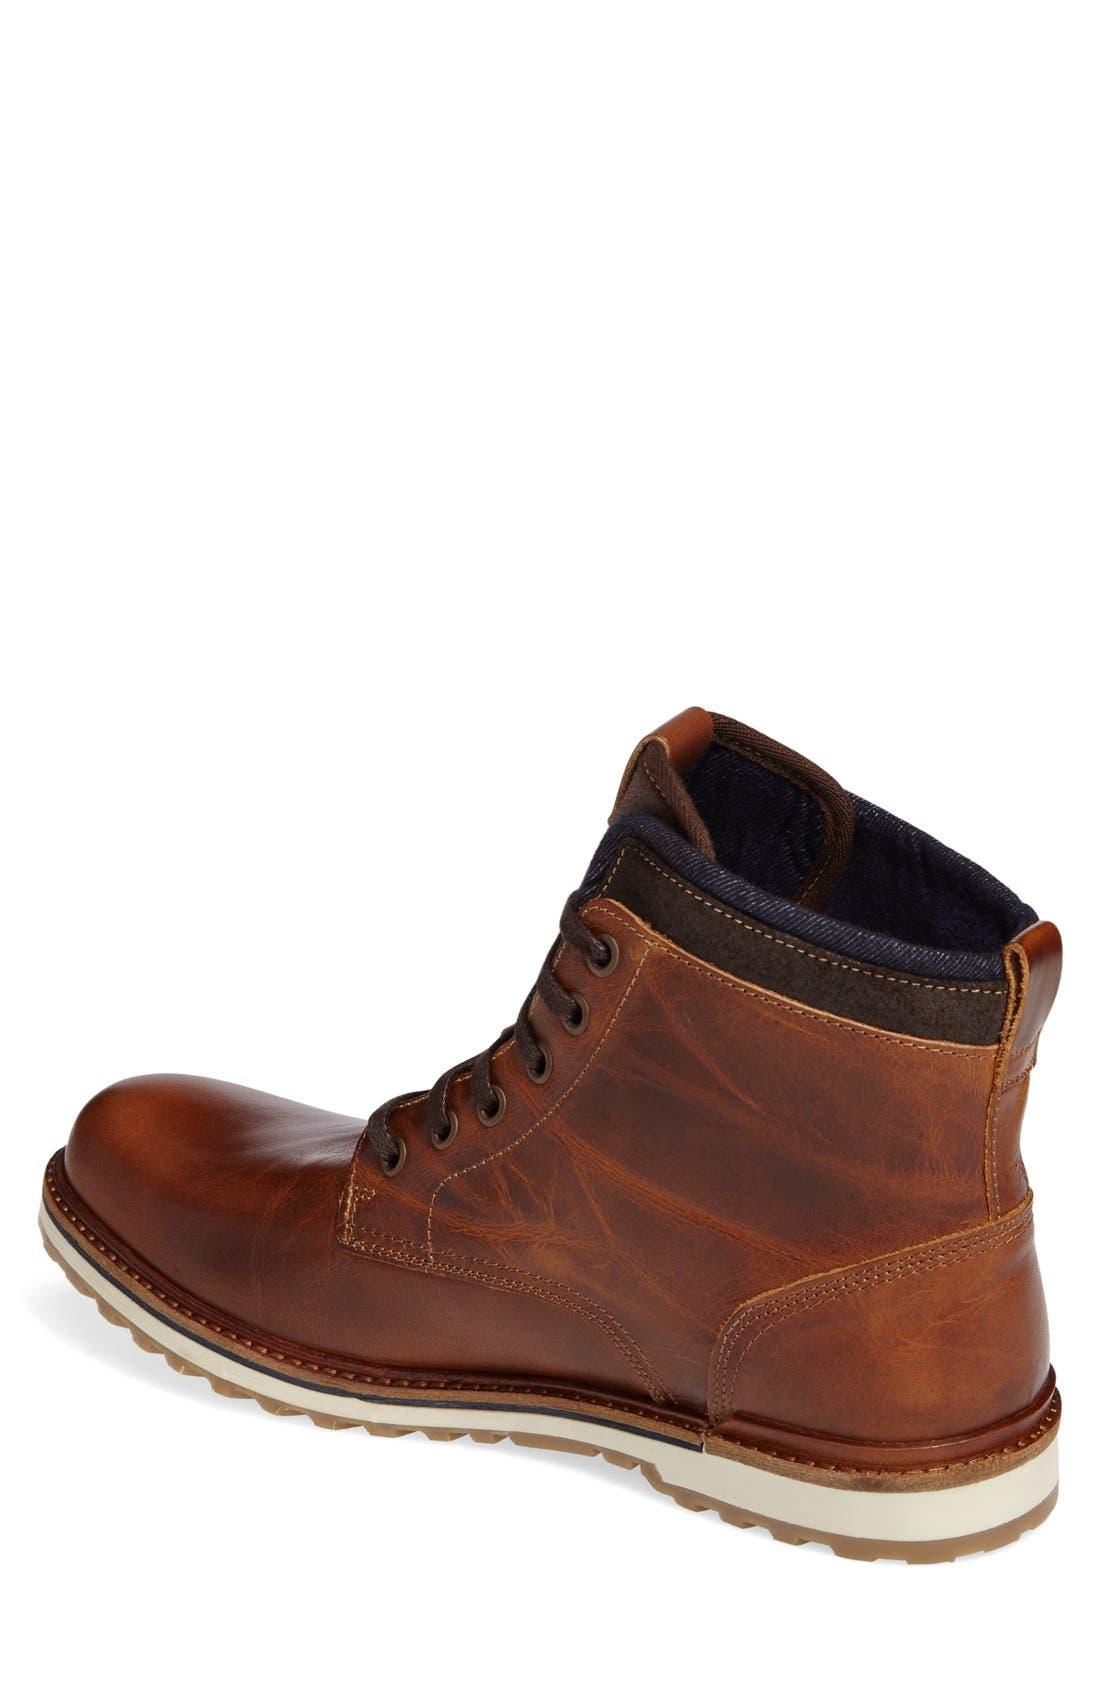 Qorellan Plain Toe Boot,                             Alternate thumbnail 2, color,                             240